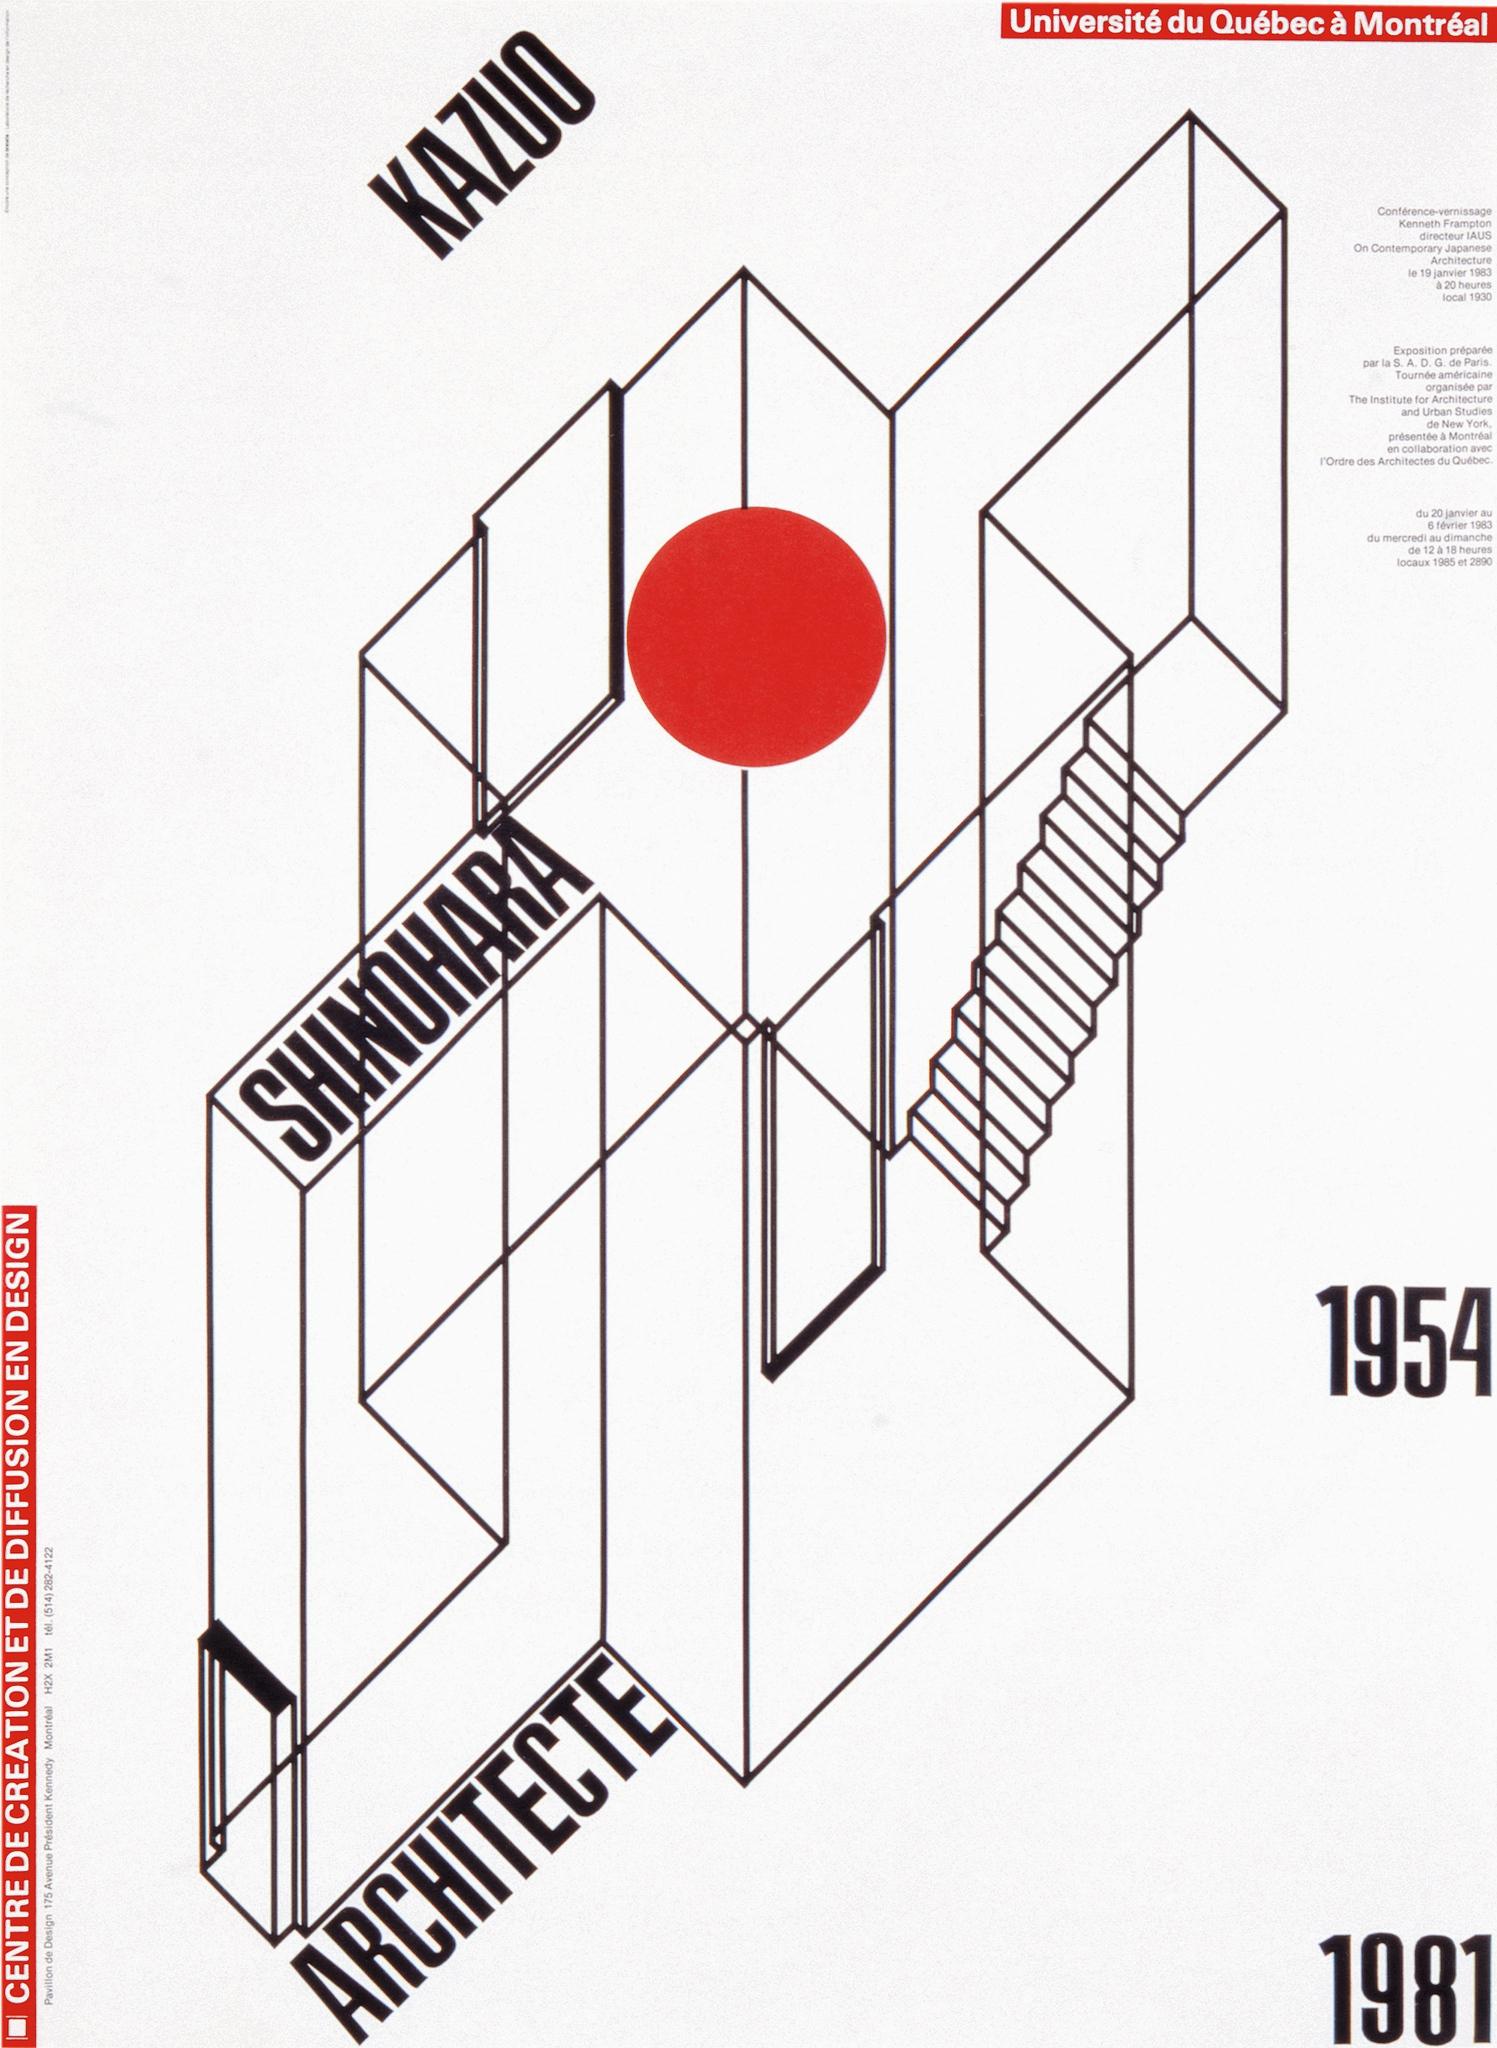 1983 - Exposition - Kazuo Shinohara architecte japonais 1954-1981 ©Alfred Halasa